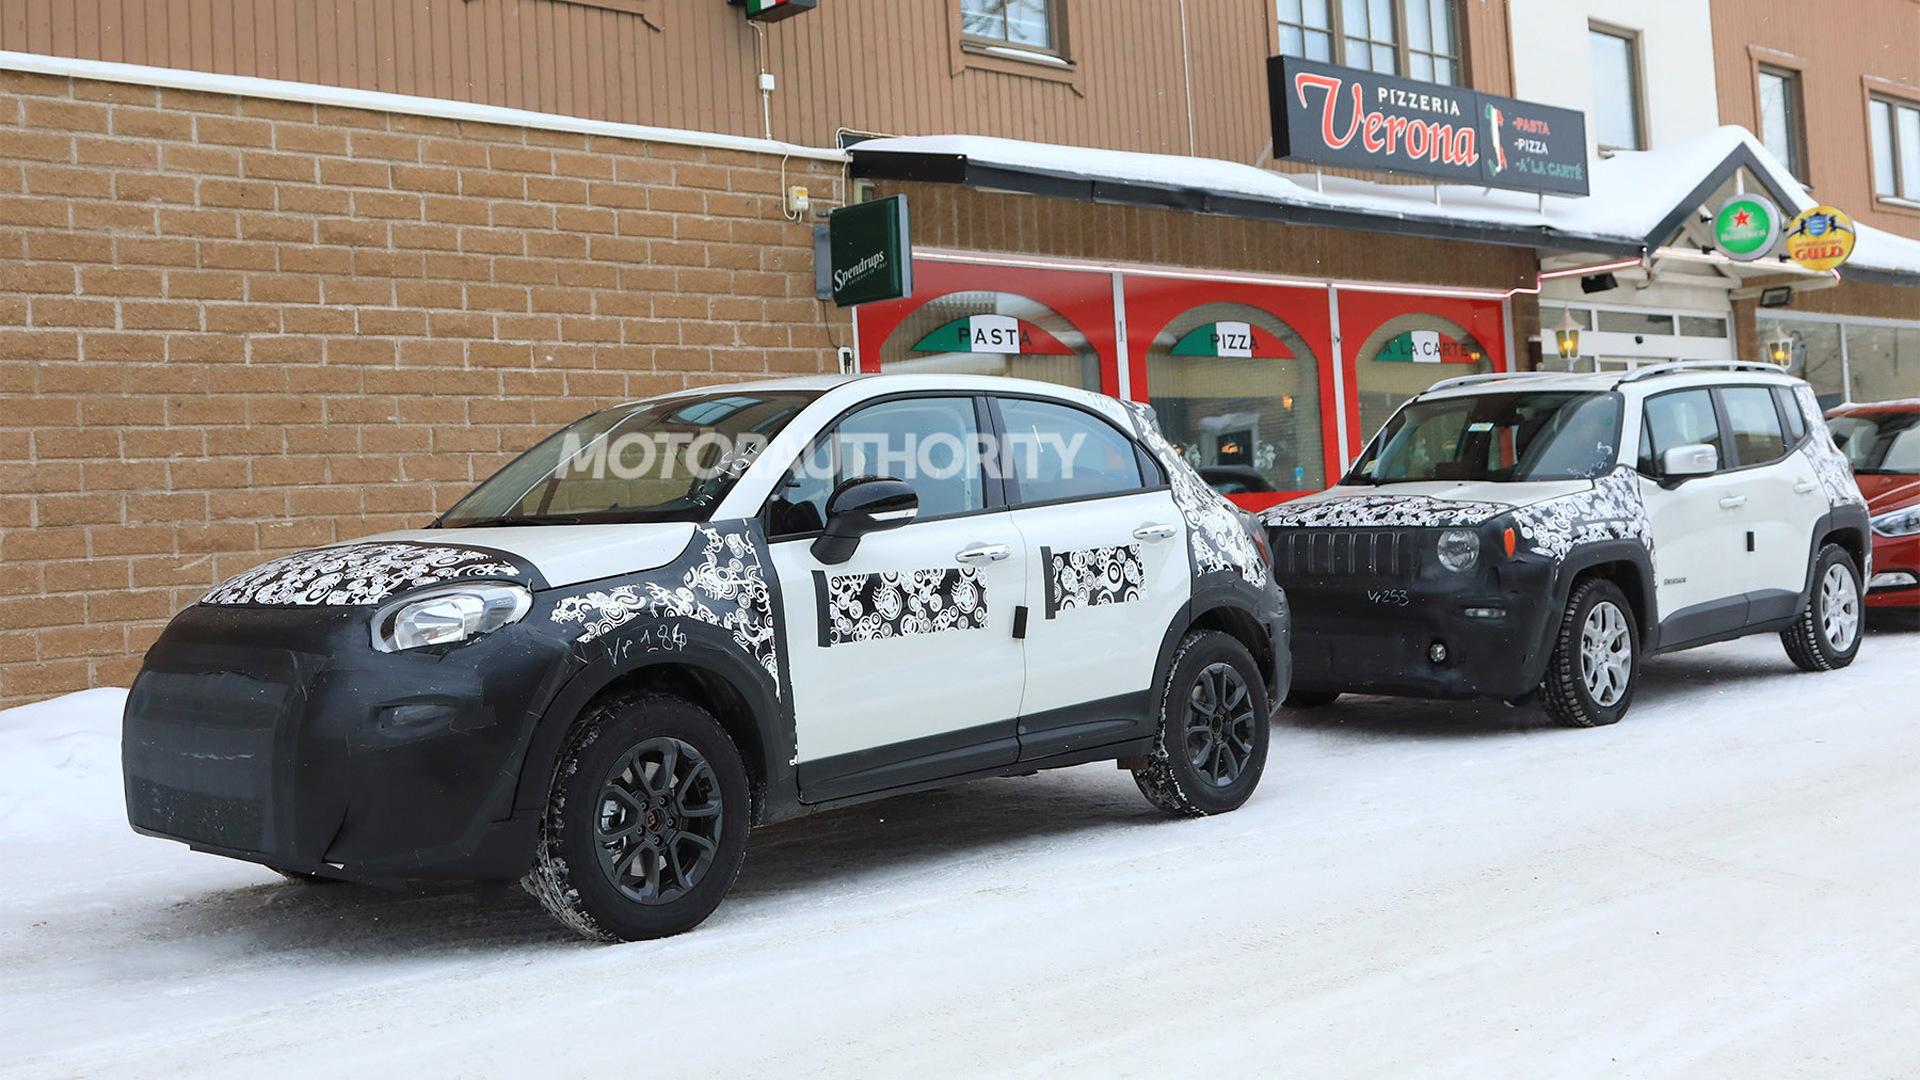 2019 Fiat 500X spy shots - Image via S. Baldauf/SB-Medien